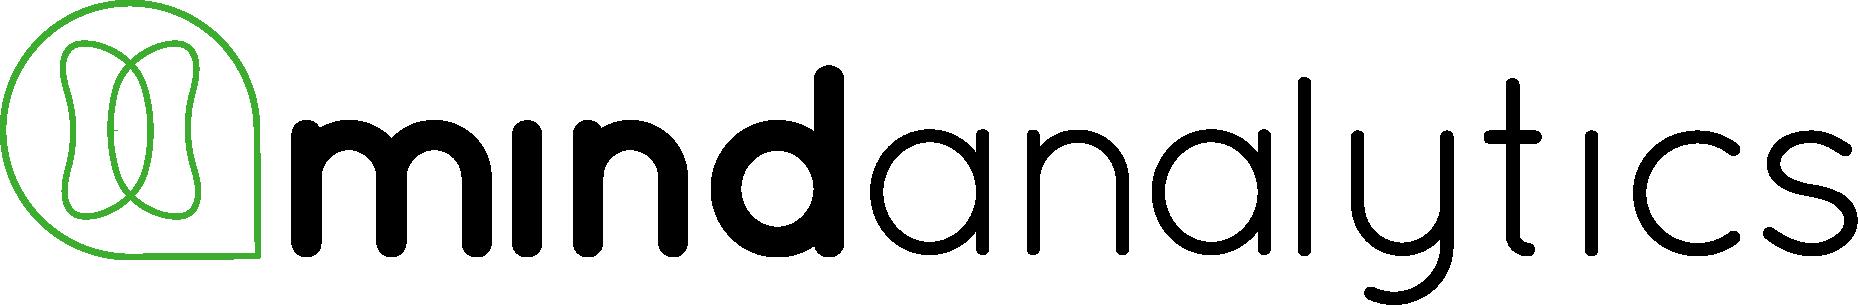 mindanalytics logo